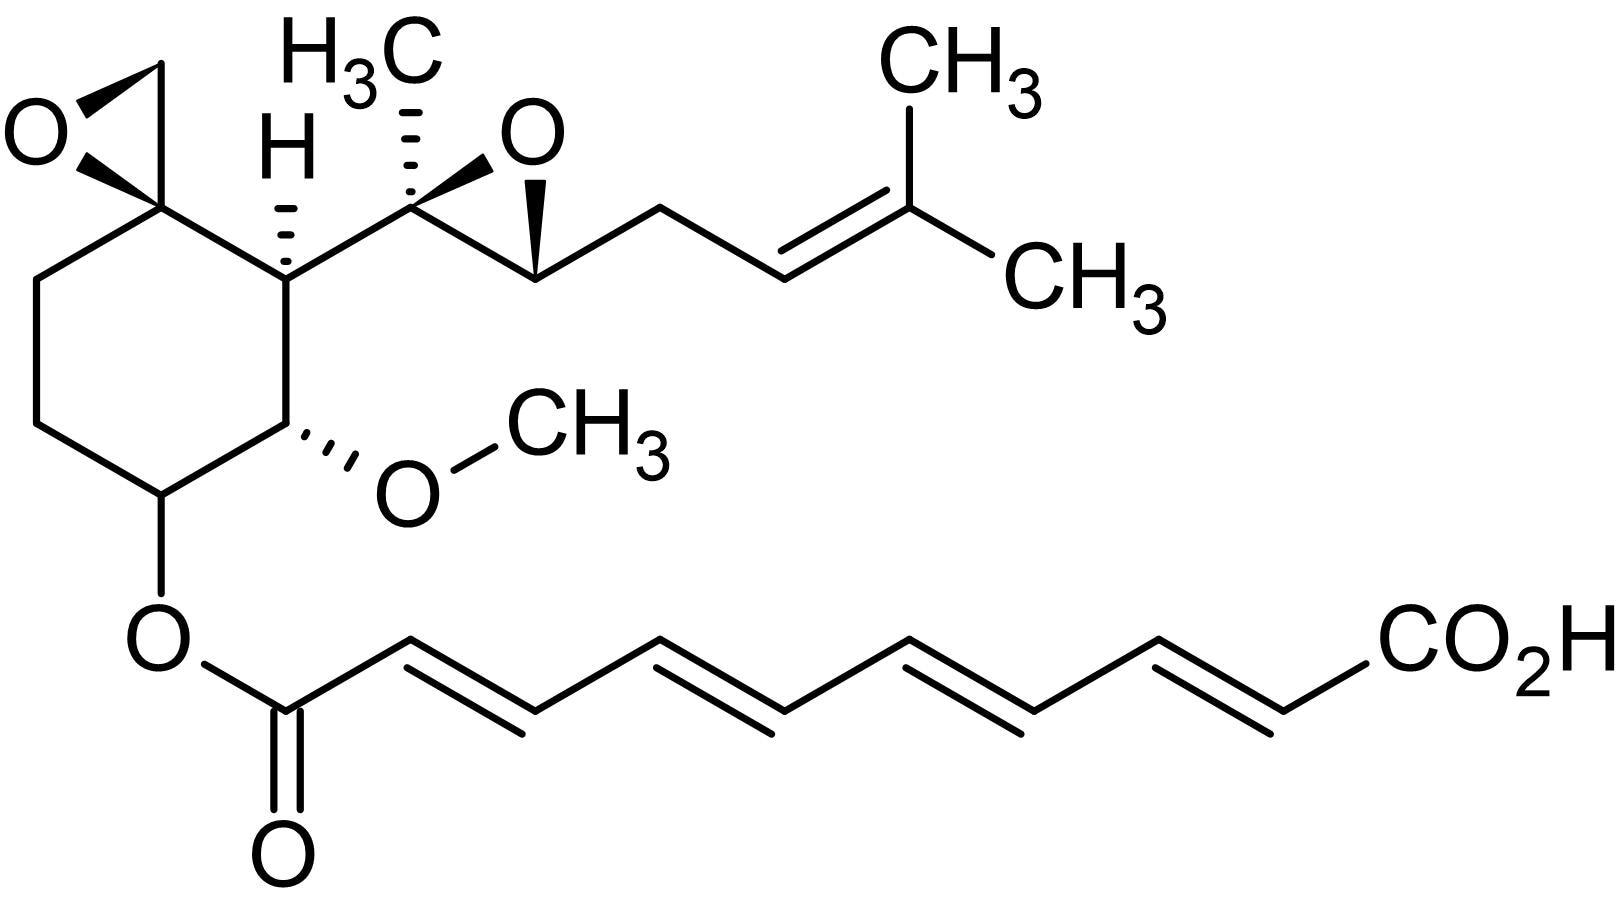 Chemical Structure - Fumagillin, methionine aminopeptidase-2 (MetAP<sub>2</sub>) inhibitor (ab141527)